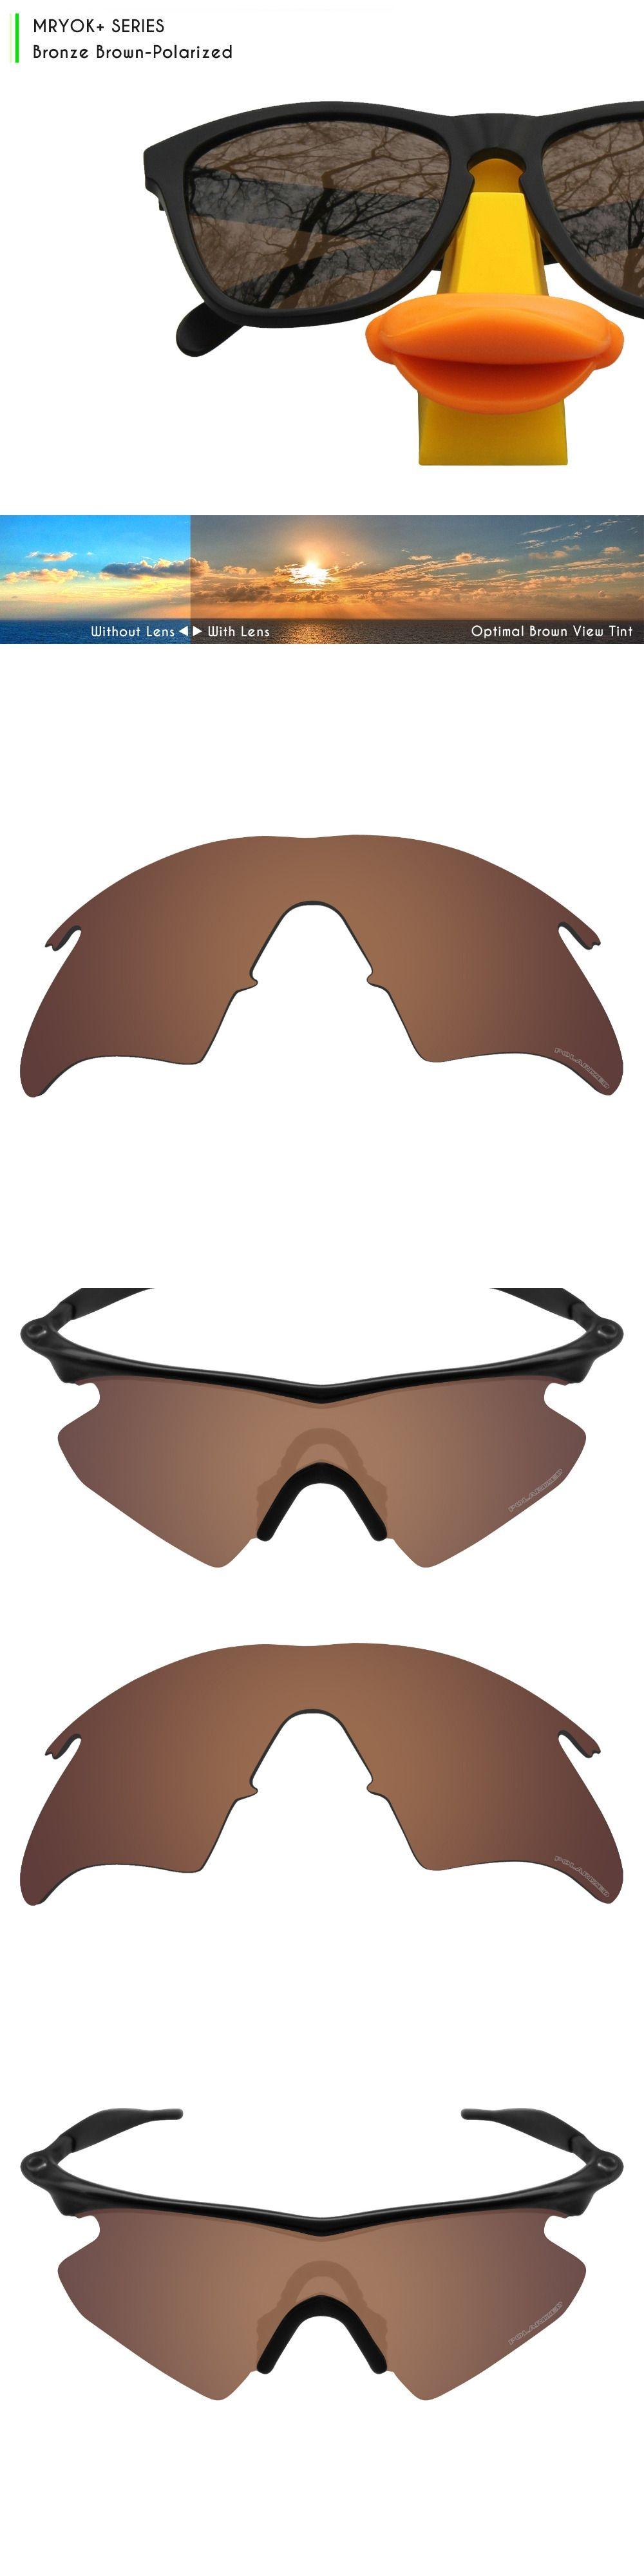 e74e68c214060 ... sale mryok polarized resist seawater replacement lenses for oakley m  frame heater sunglasses bronze brown color